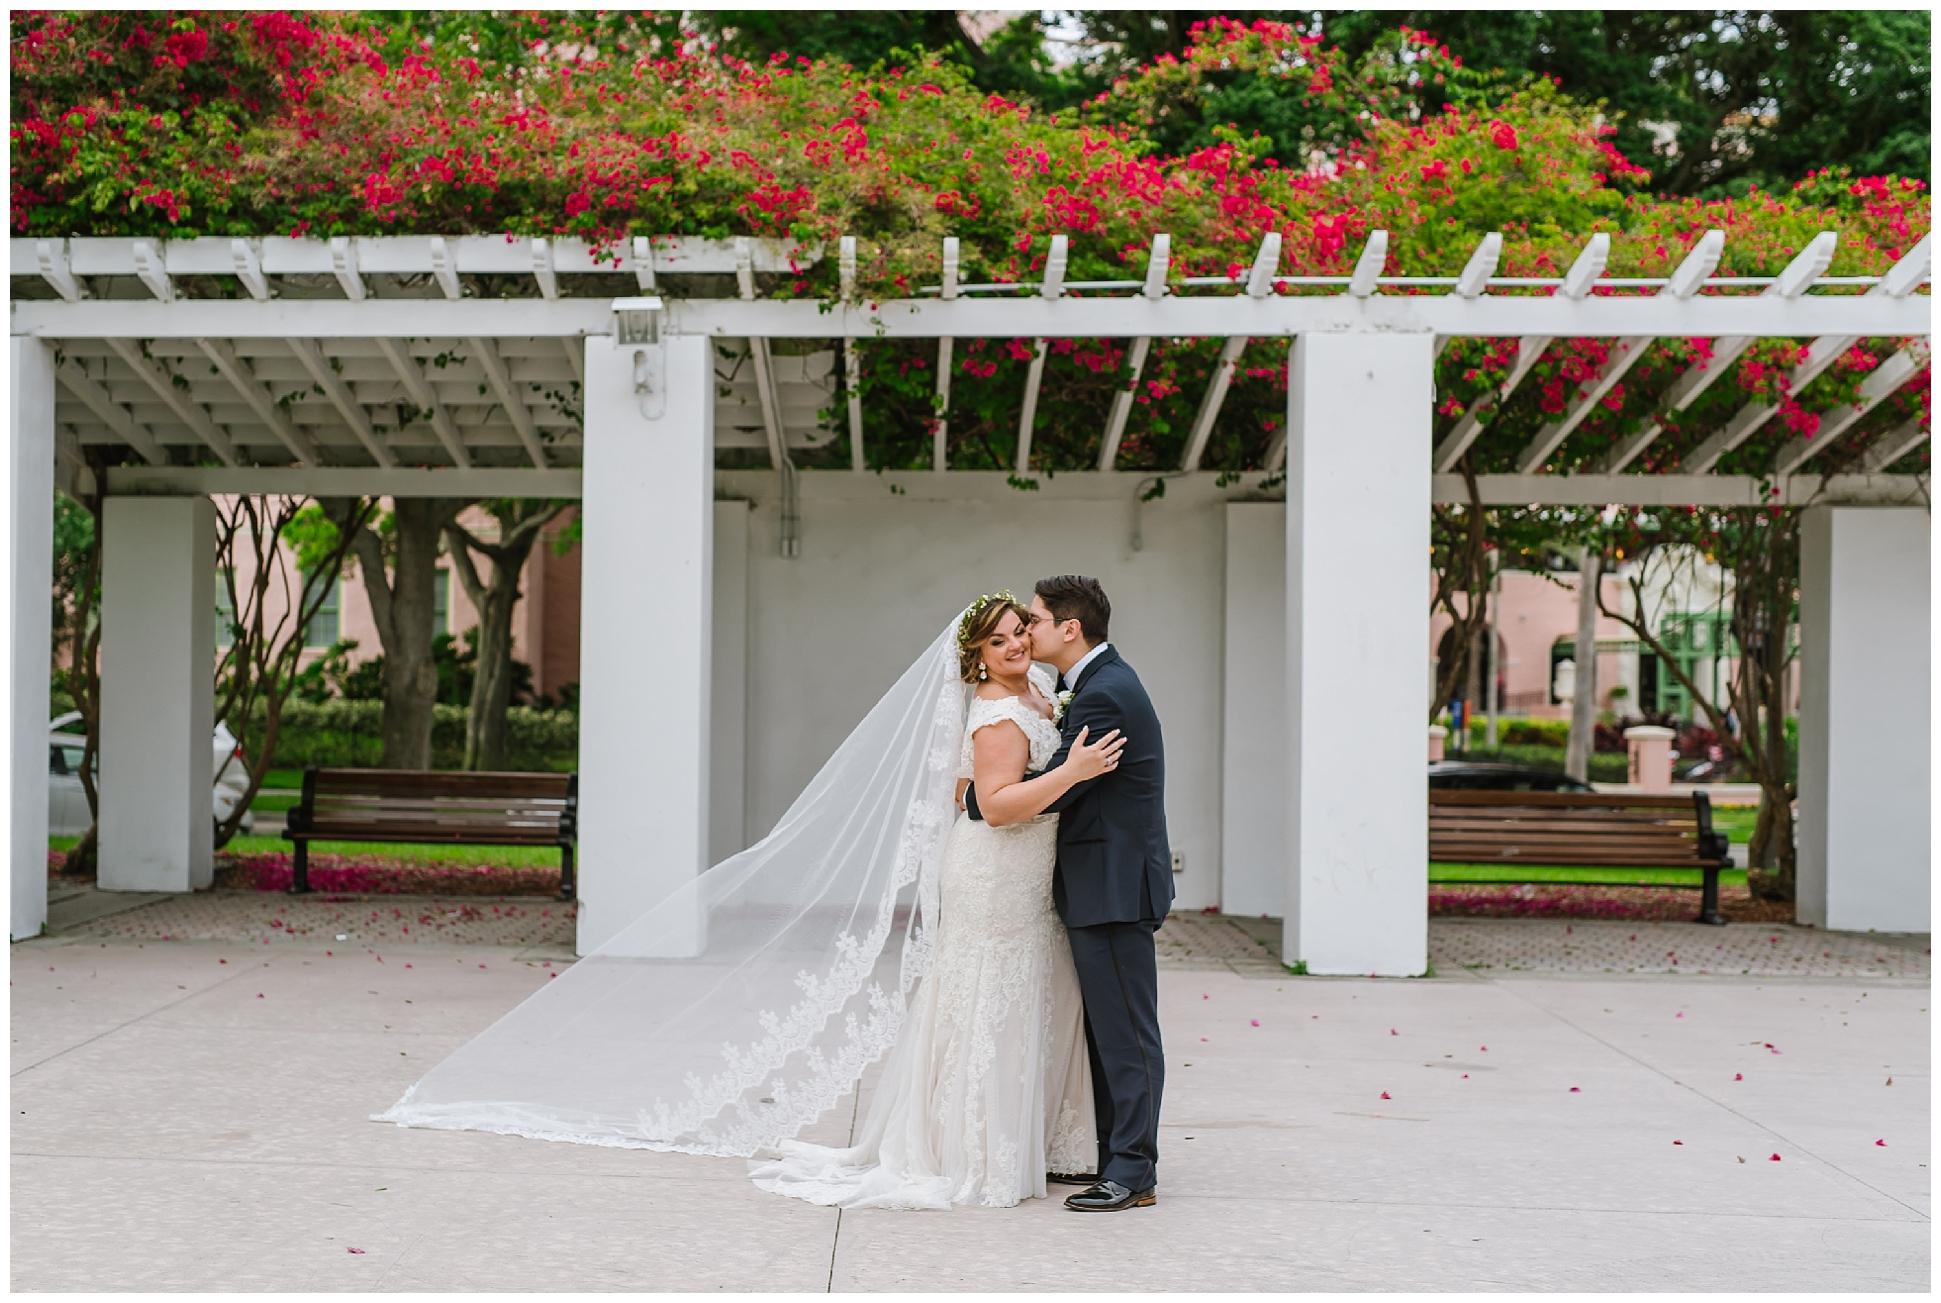 st-pete-wedding-photographer-italian-romance-theme-rustic-flower-crown_0419.jpg